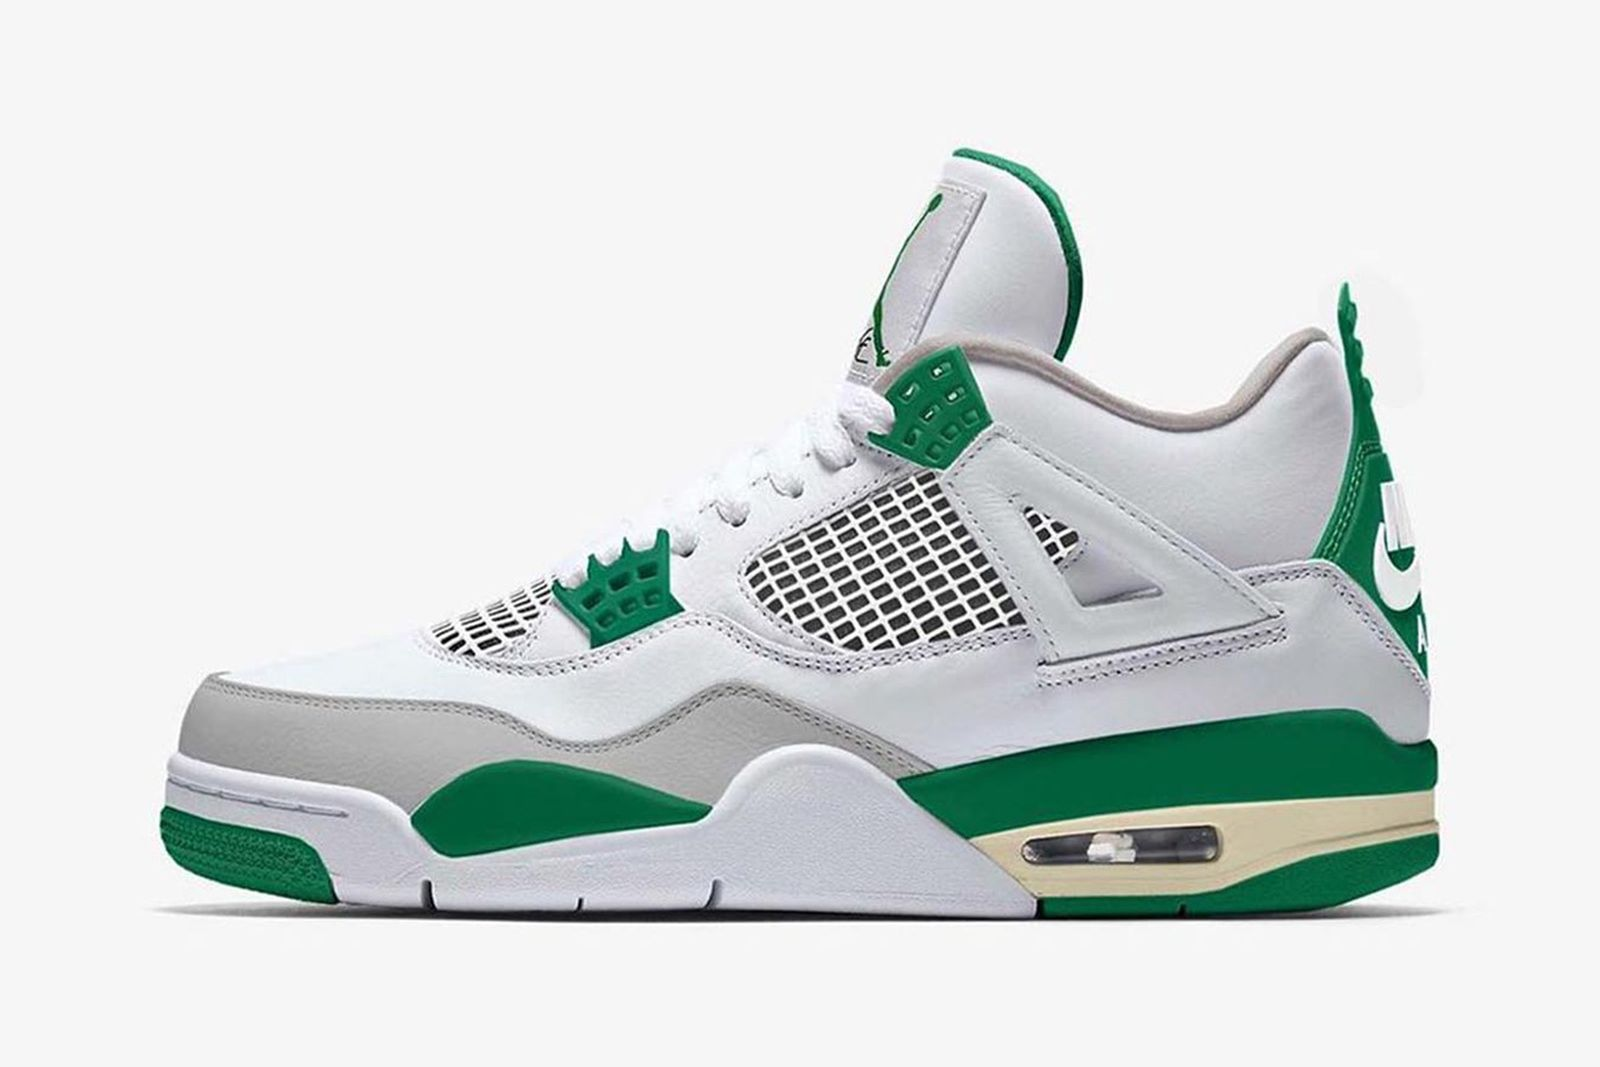 Nike Air Jordan 4 Pine Green: Rumored Release Information